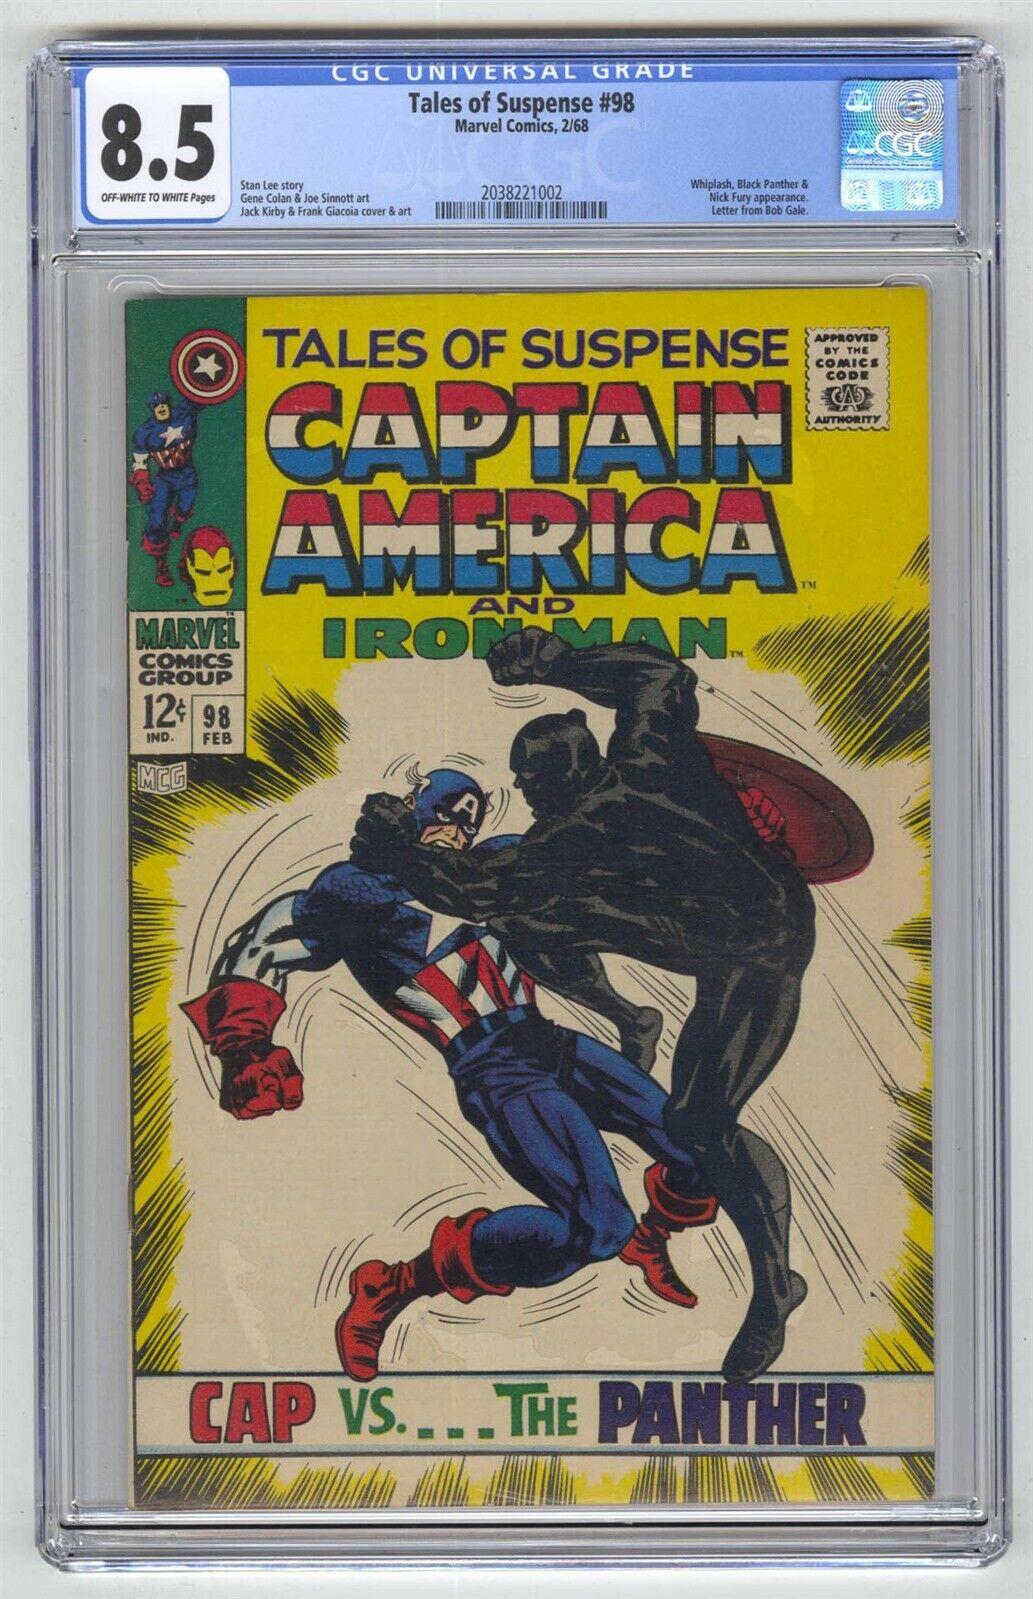 Tales of Suspense #98 CGC 8.5 HIGH GRADE Marvel Comic KEY Black Panther vs Cap